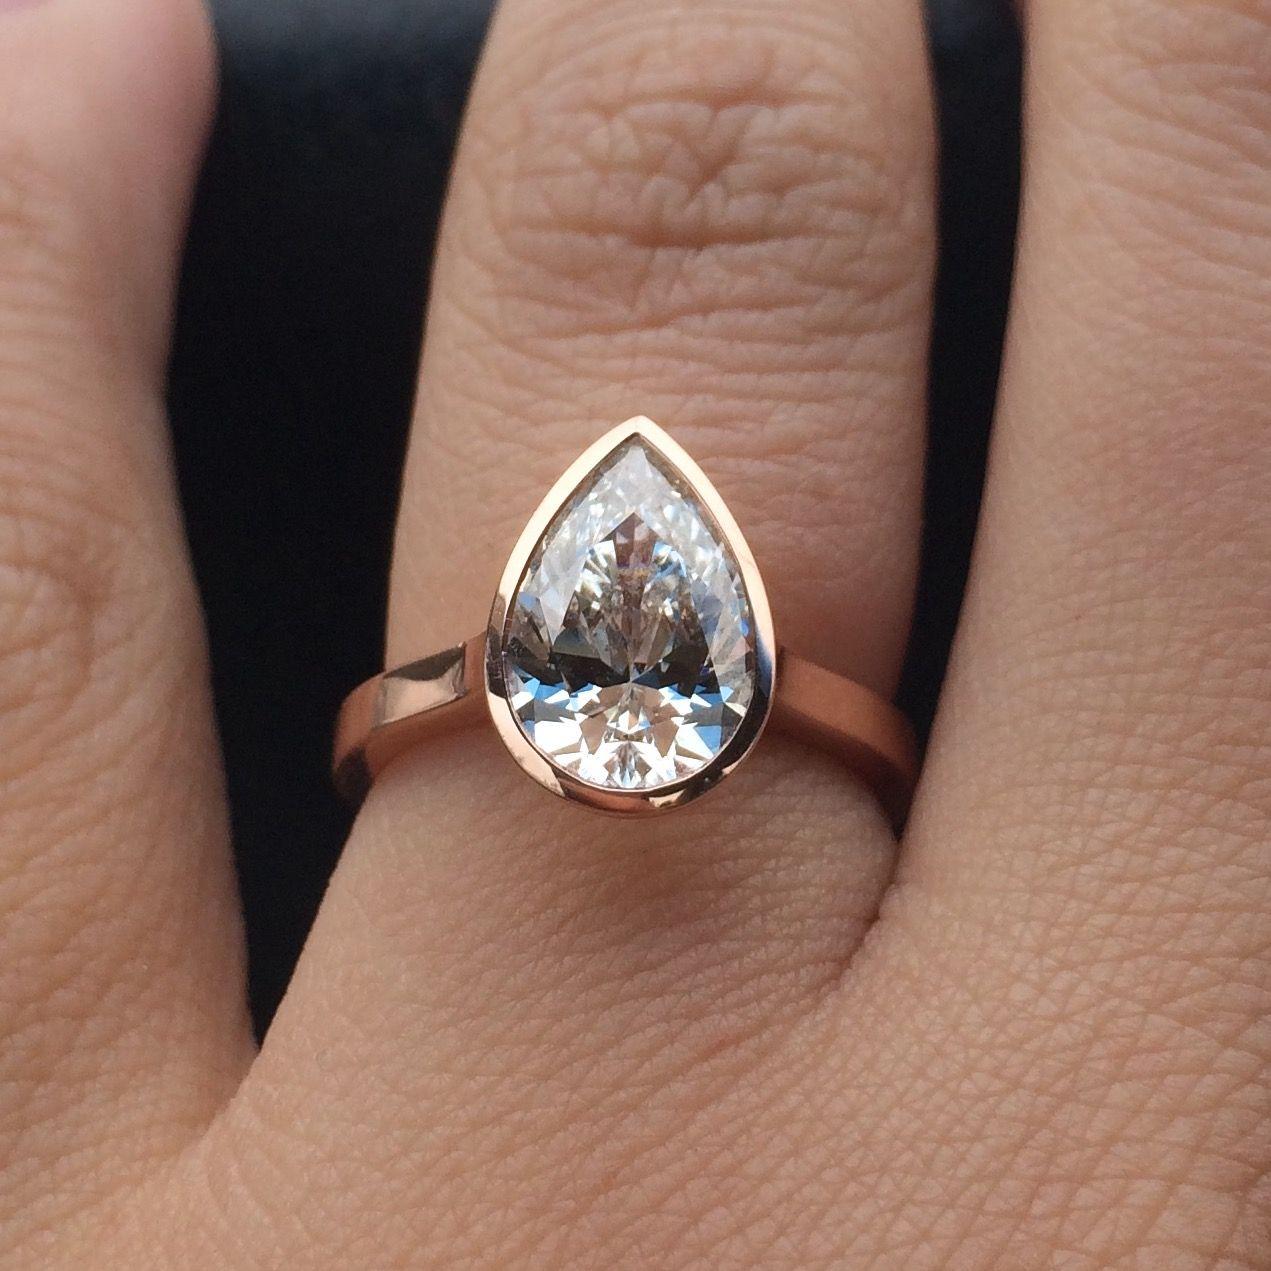 Let Me See Those Pears Engagement Ring Shapes Bezel Set